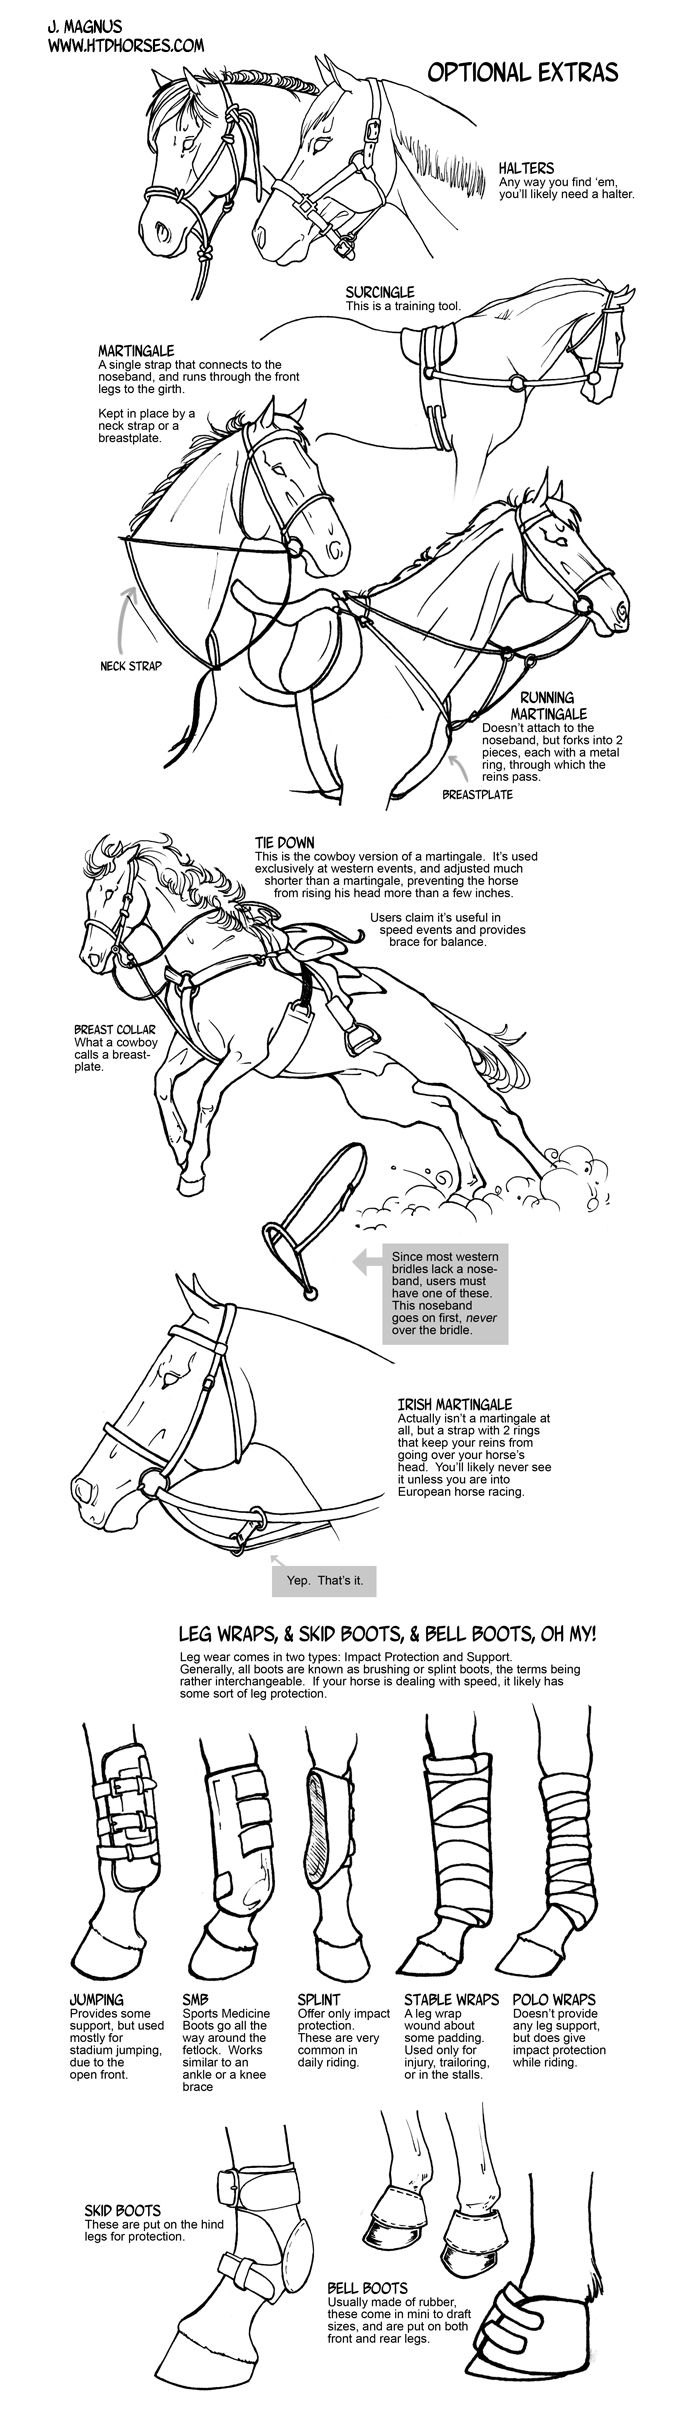 How to draw tack Optional Extras by sketcherjak.deviantart.com on @DeviantArt